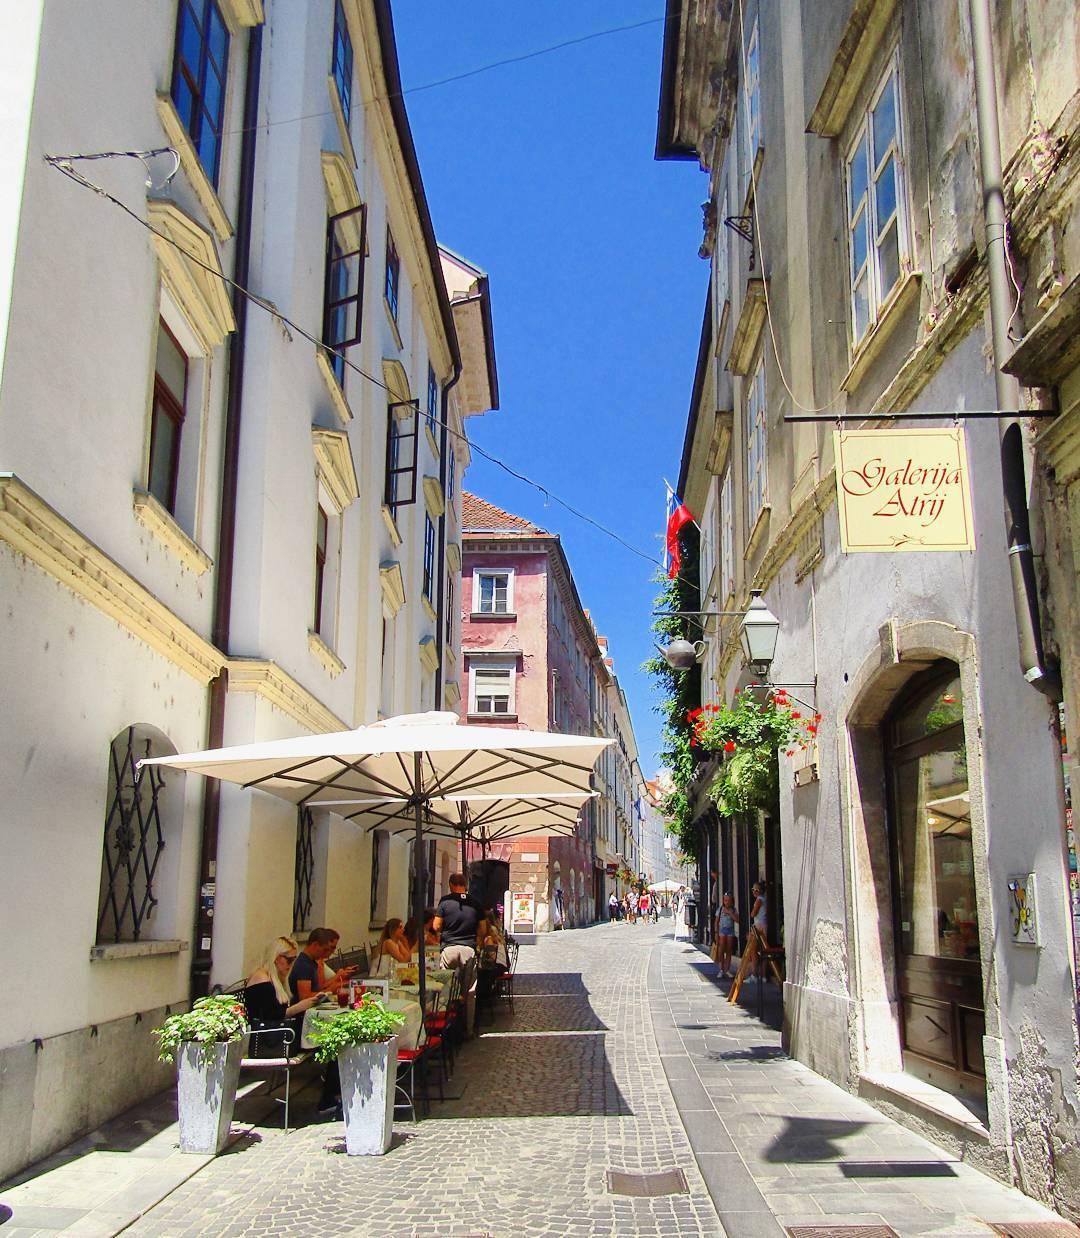 One Week in Slovenia – Ljubljana, Bled, Piran & Portorož